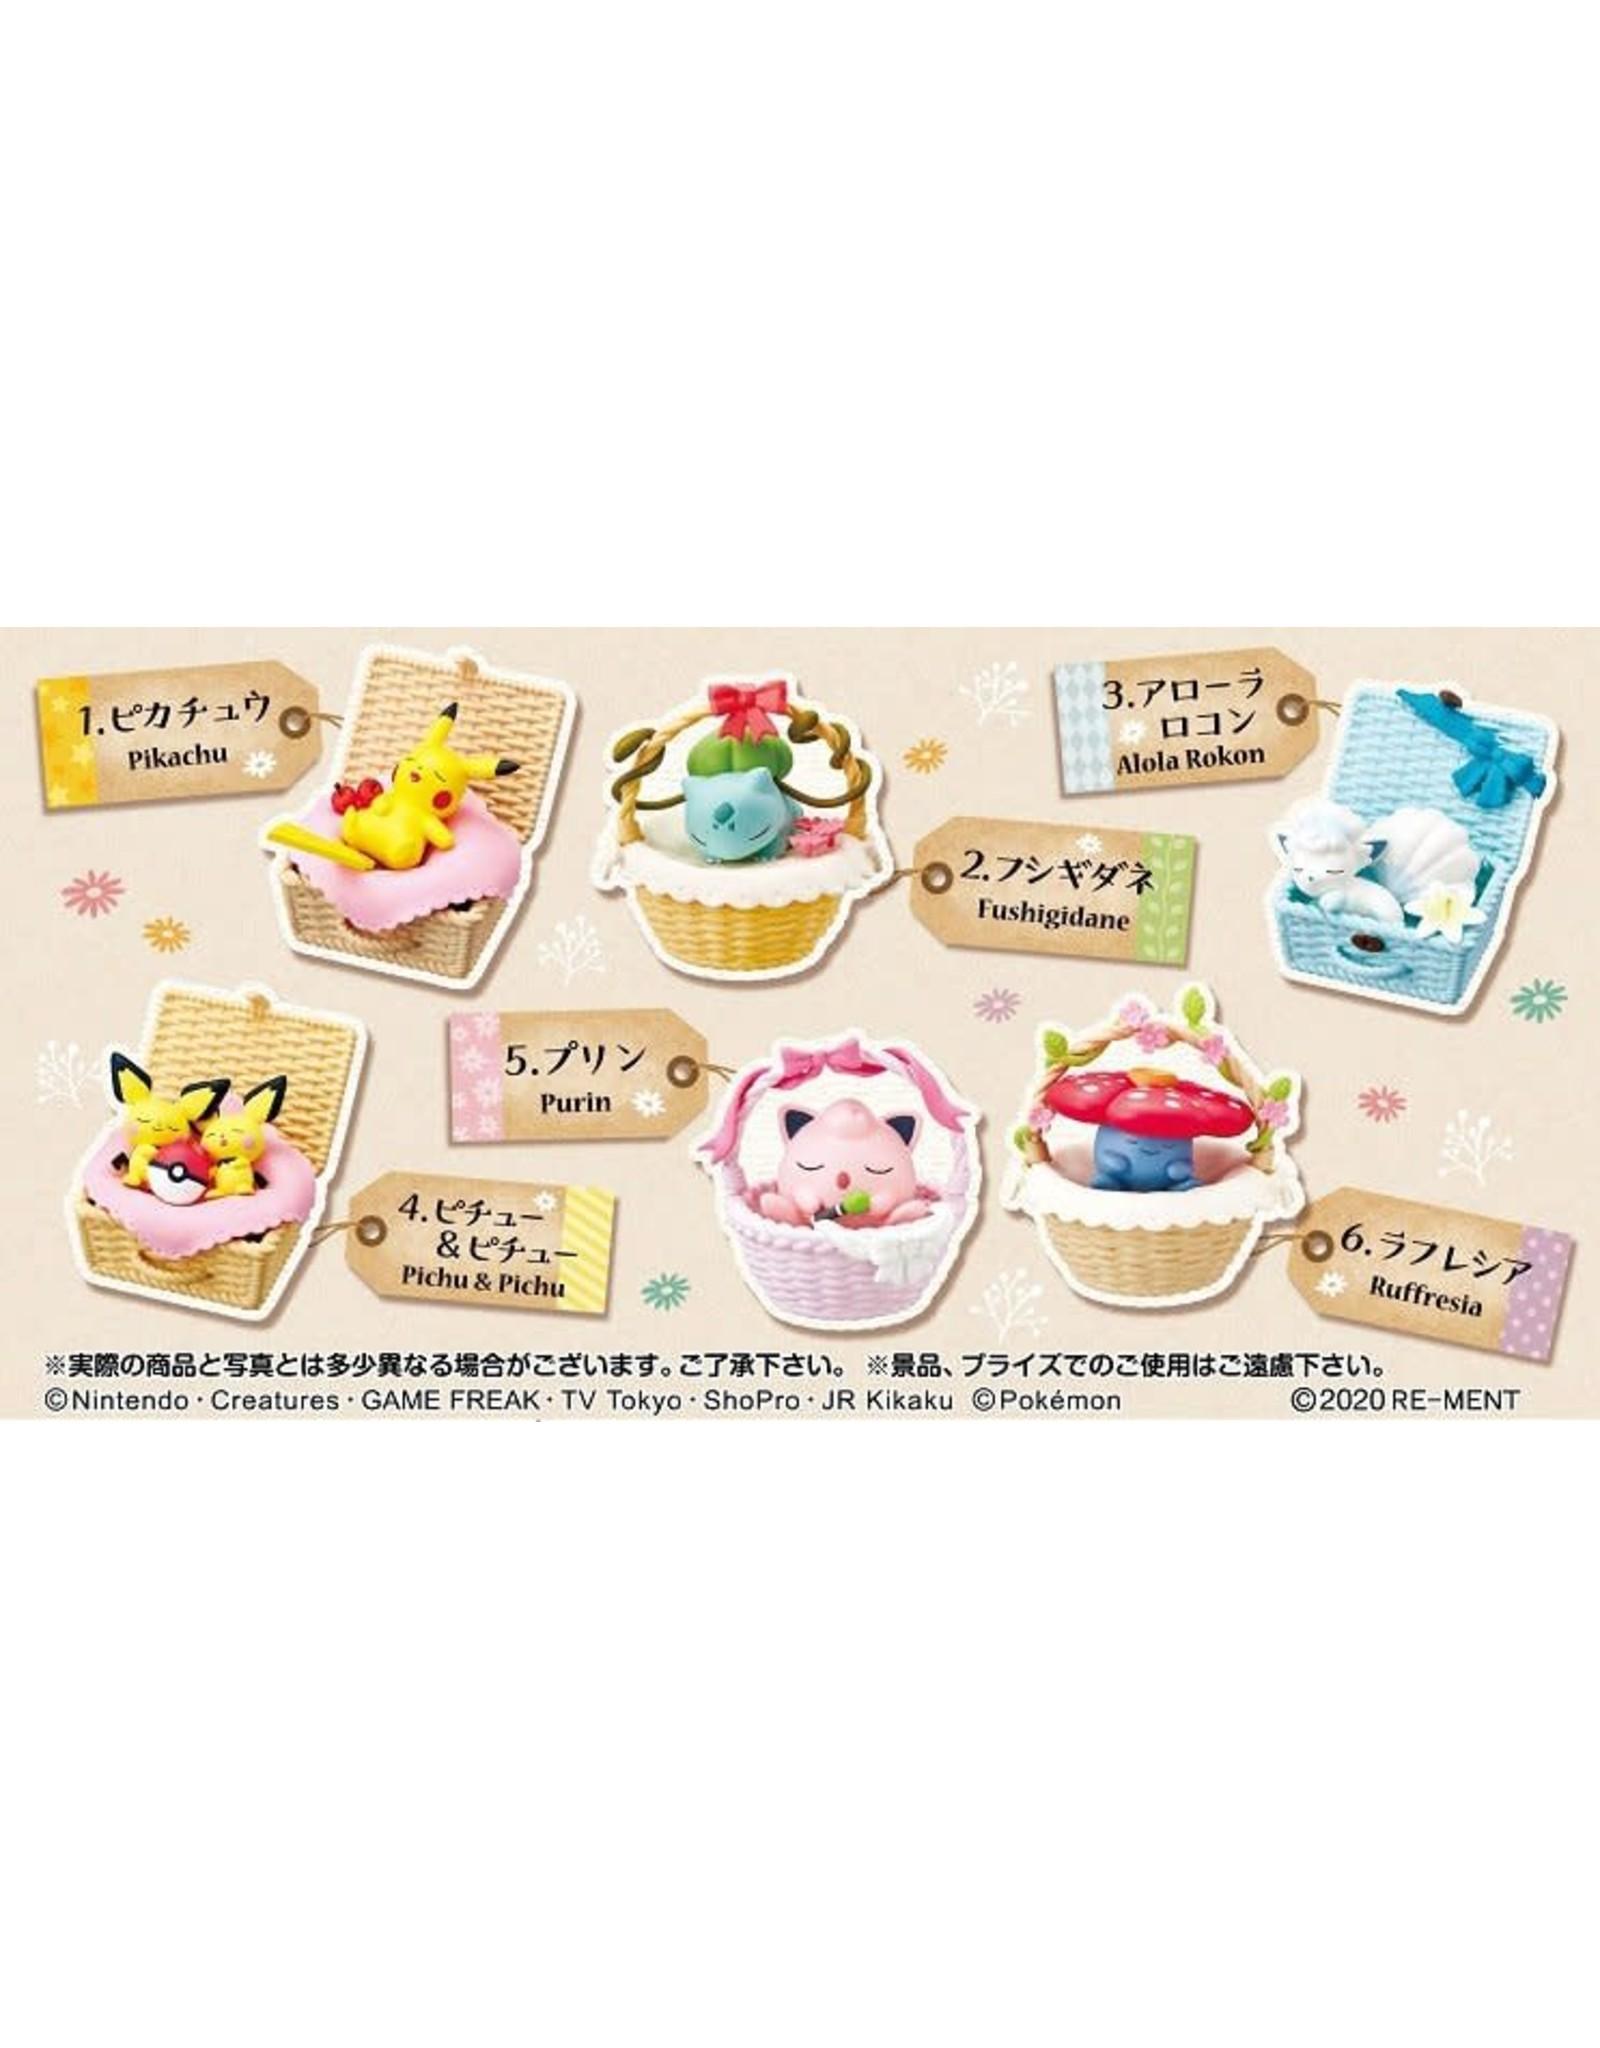 Re-Ment - Pokémon - Utatane Basket - 1 willekeurig item